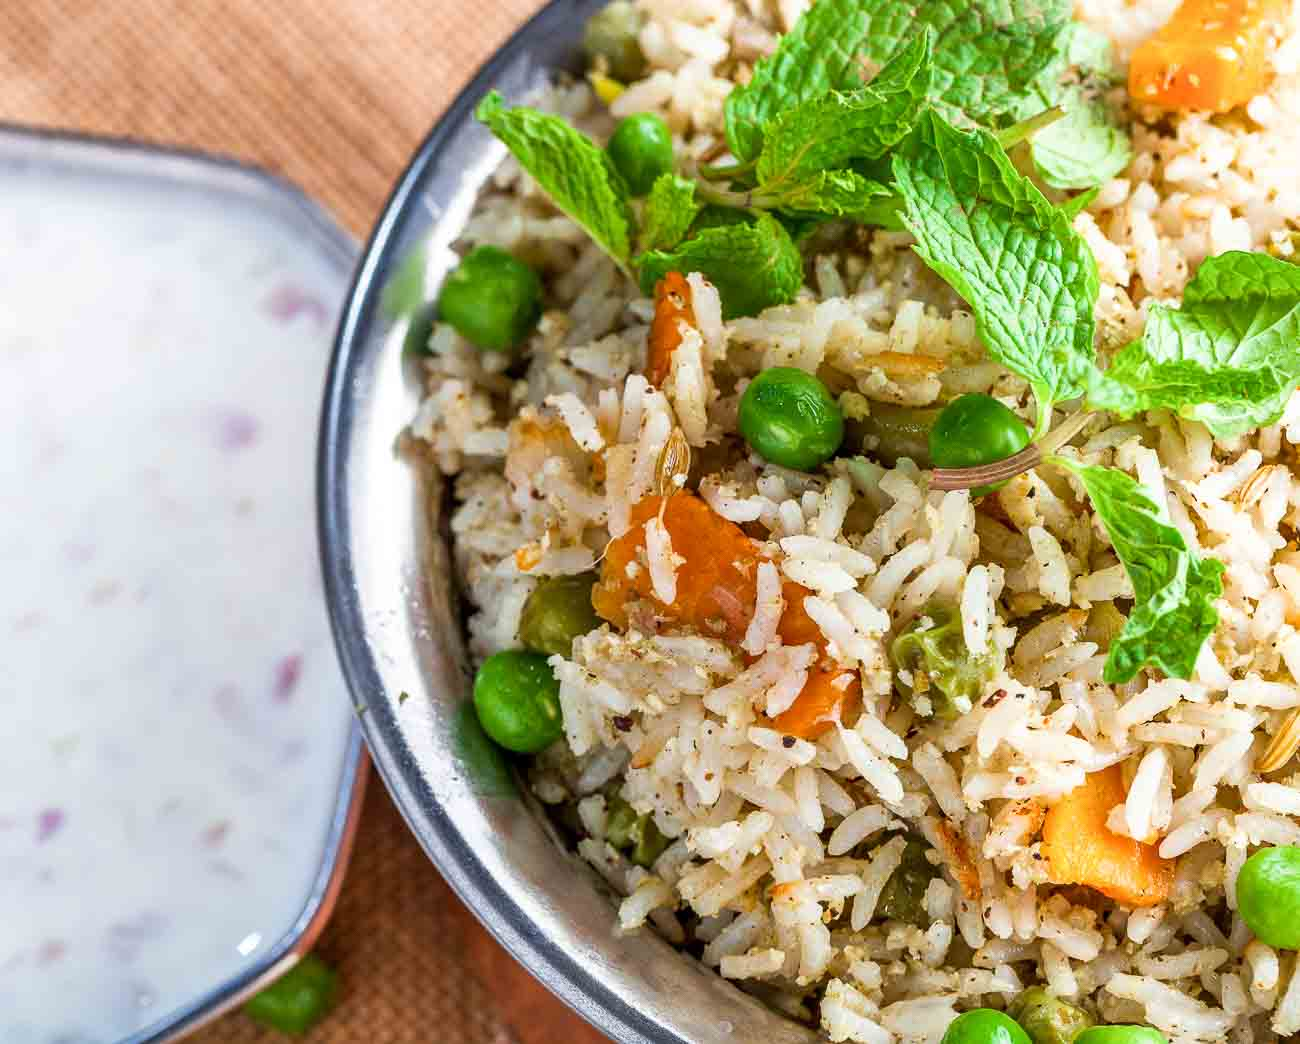 Chettinad Vegetable Pulao Recipe